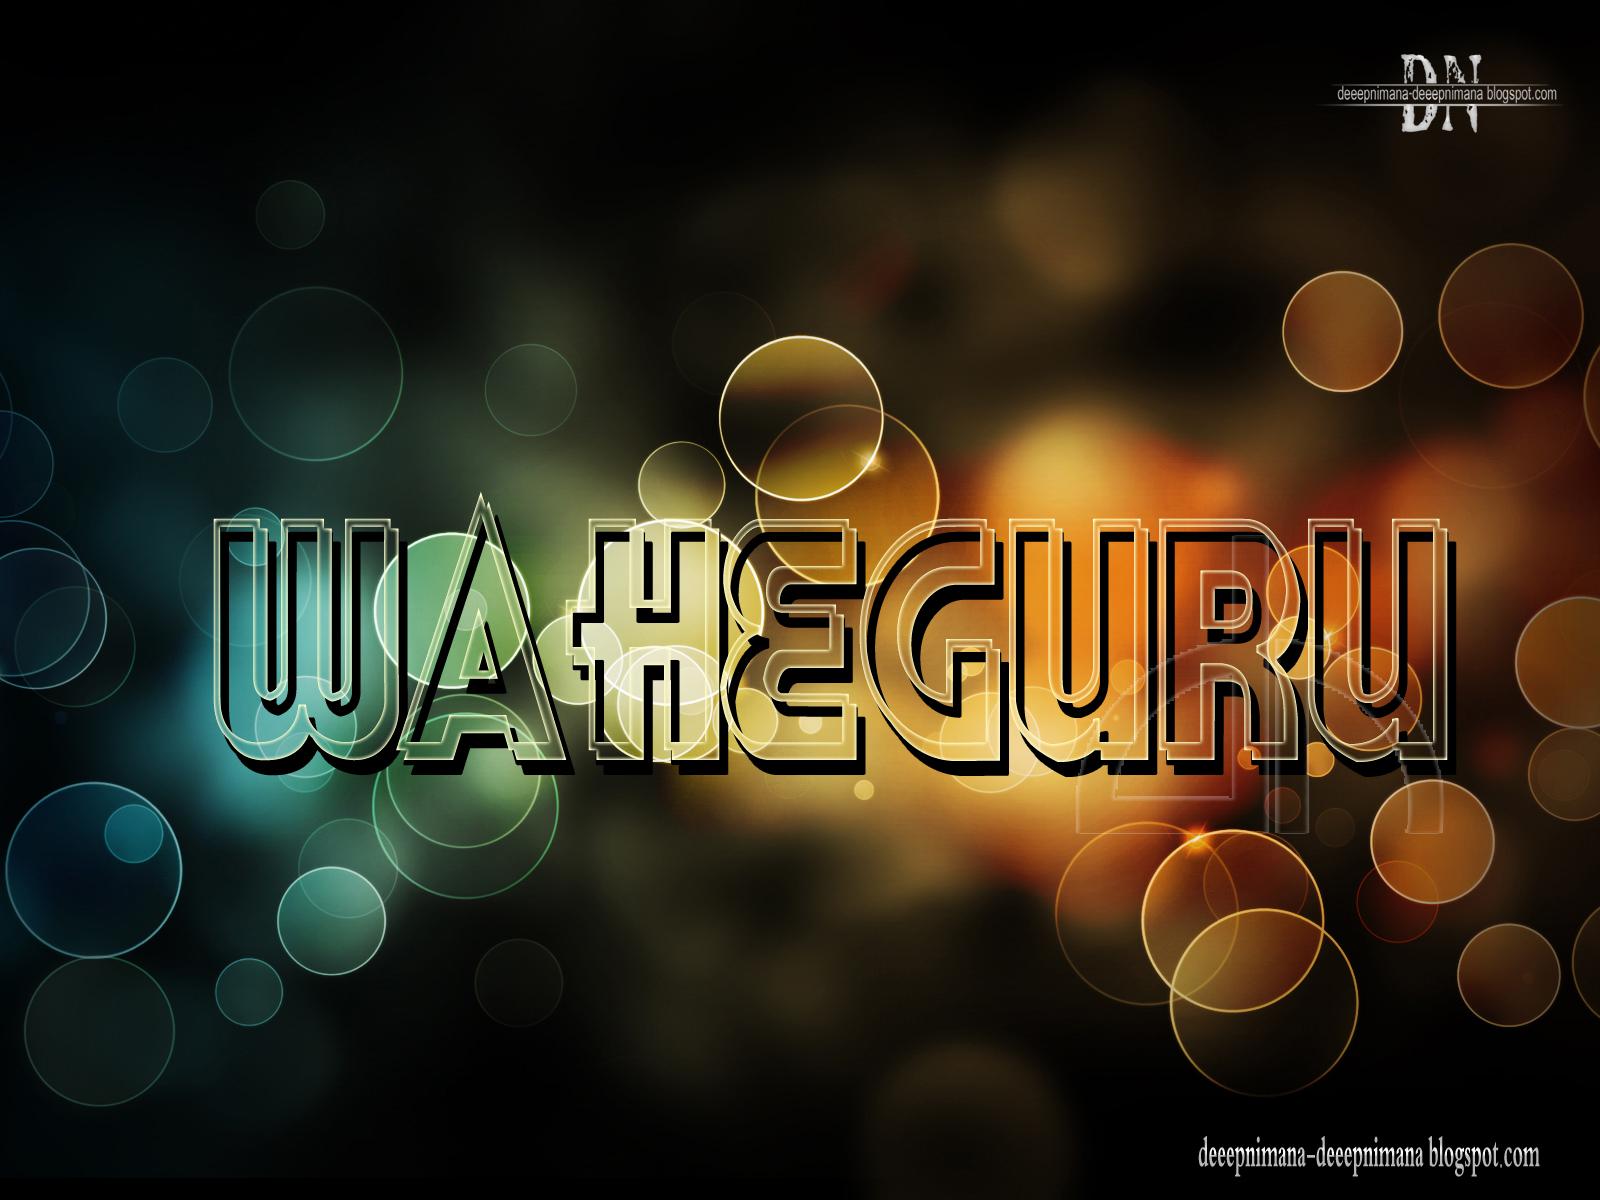 deeepnimana-deeepnimana blogspot.com: waheguru naam simran